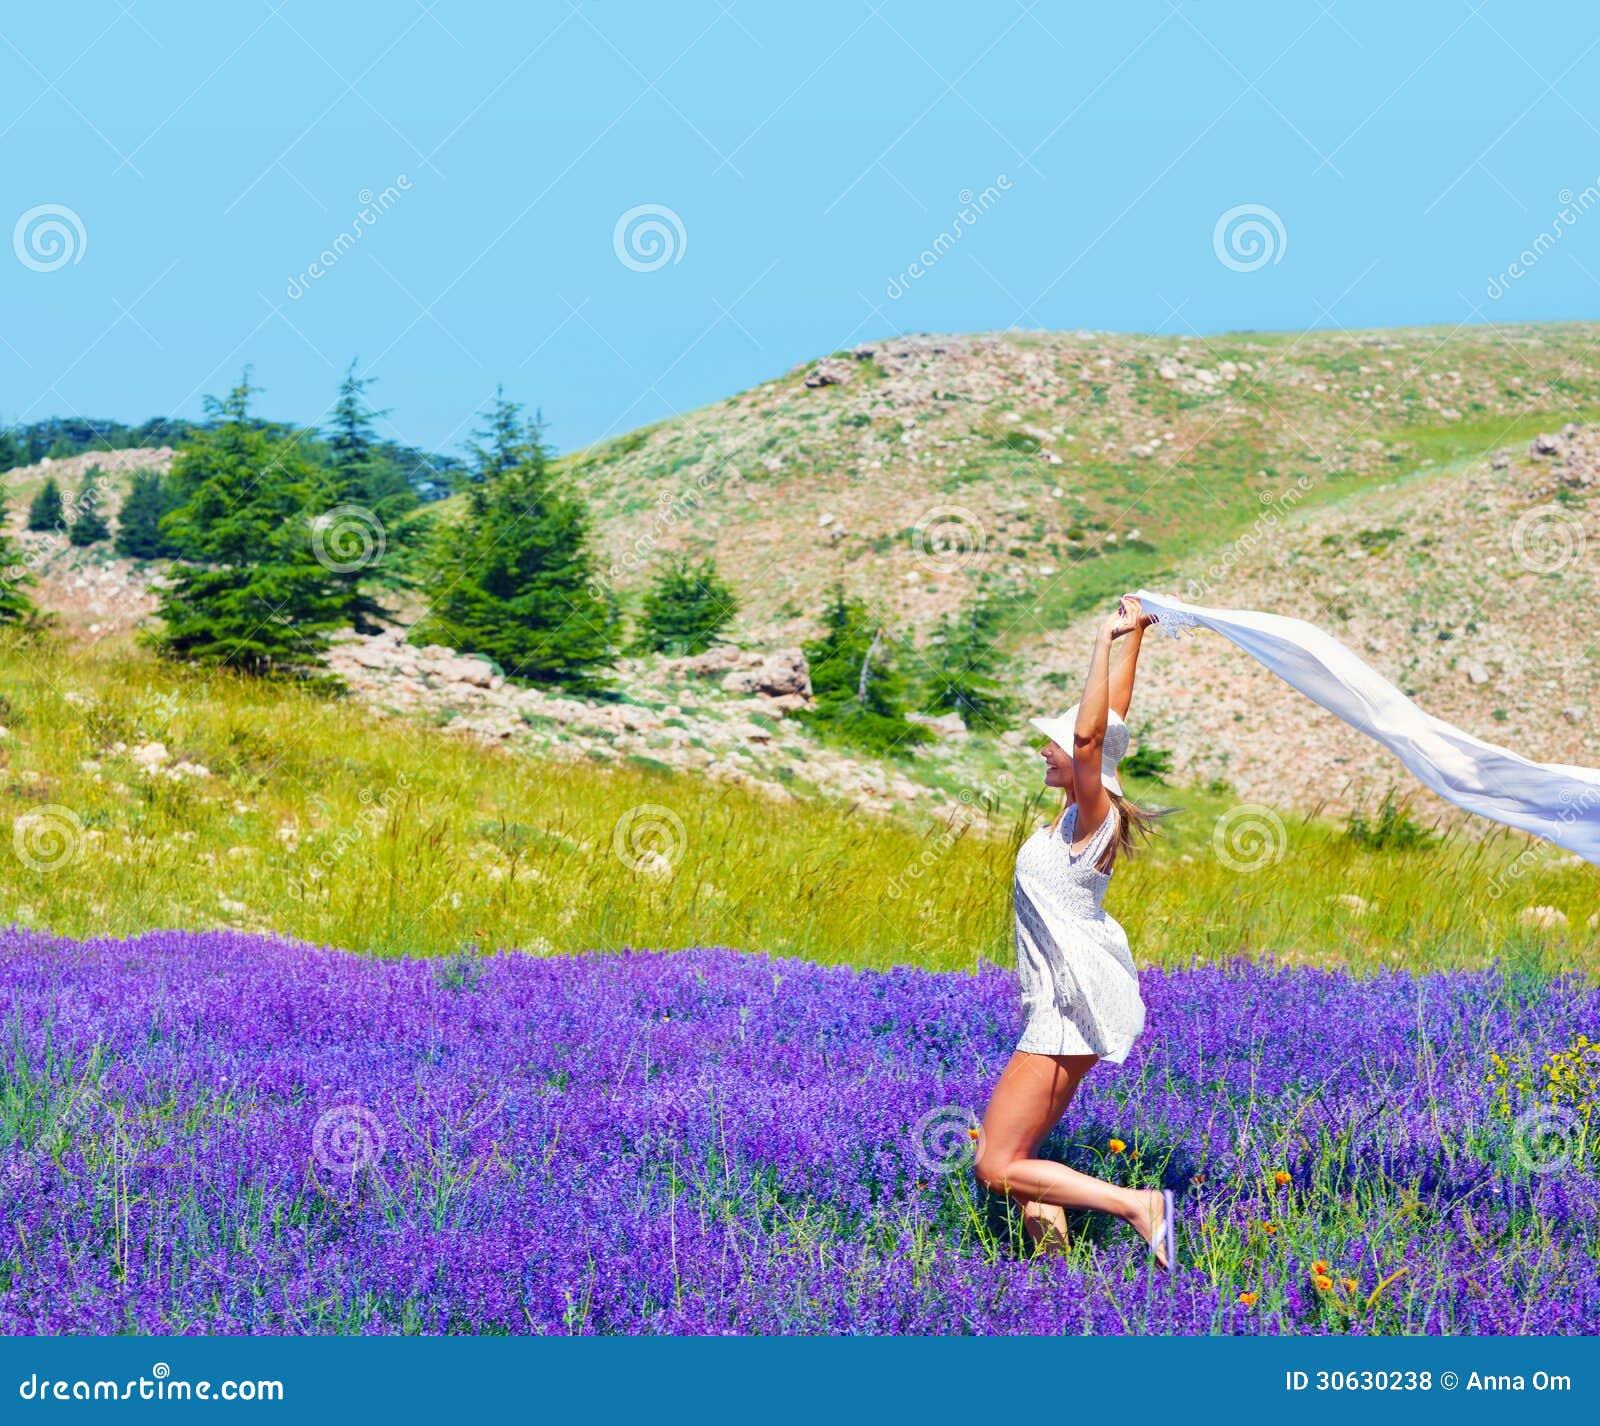 Beautiful Girl Dancing On Lavender Field Stock Photo